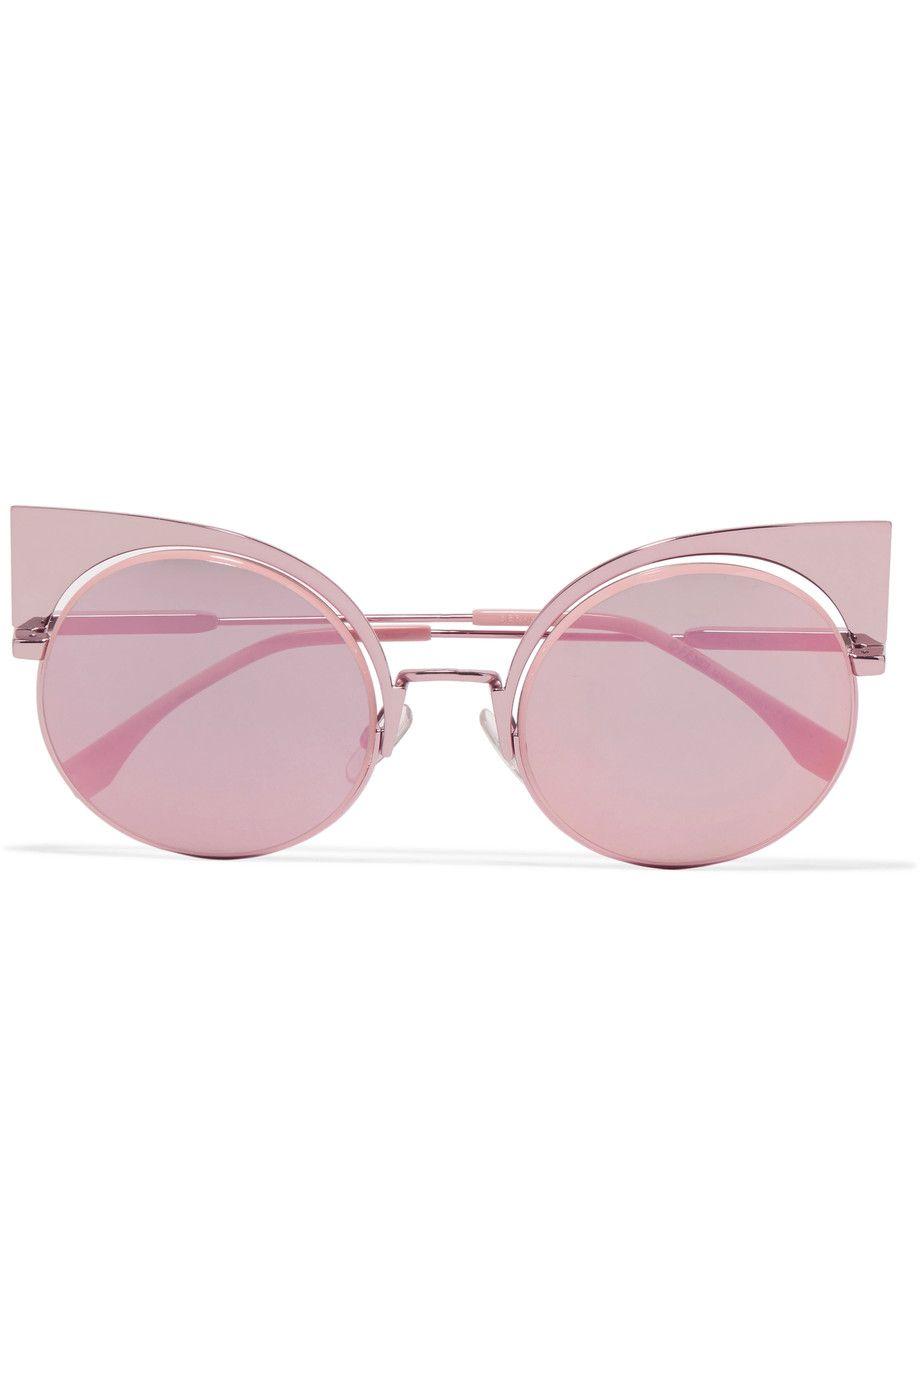 Fendi   Cat-eye metal mirrored sunglasses   NET-A-PORTER.COM ... 54c6ba5cca